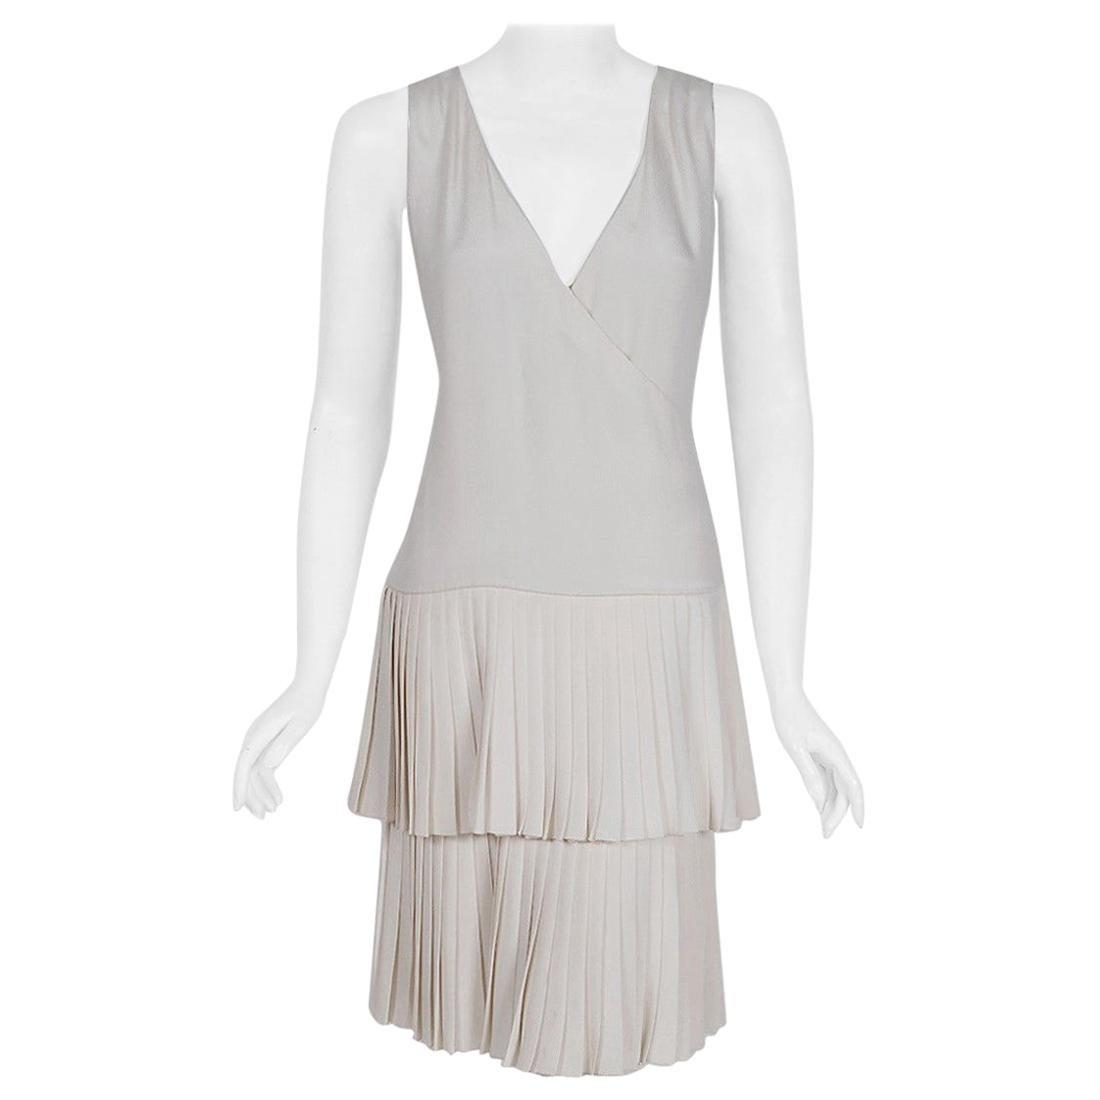 Vintage 1980 Christian Dior Haute Couture Ivory Silk Pleated Drop-Waist Dress